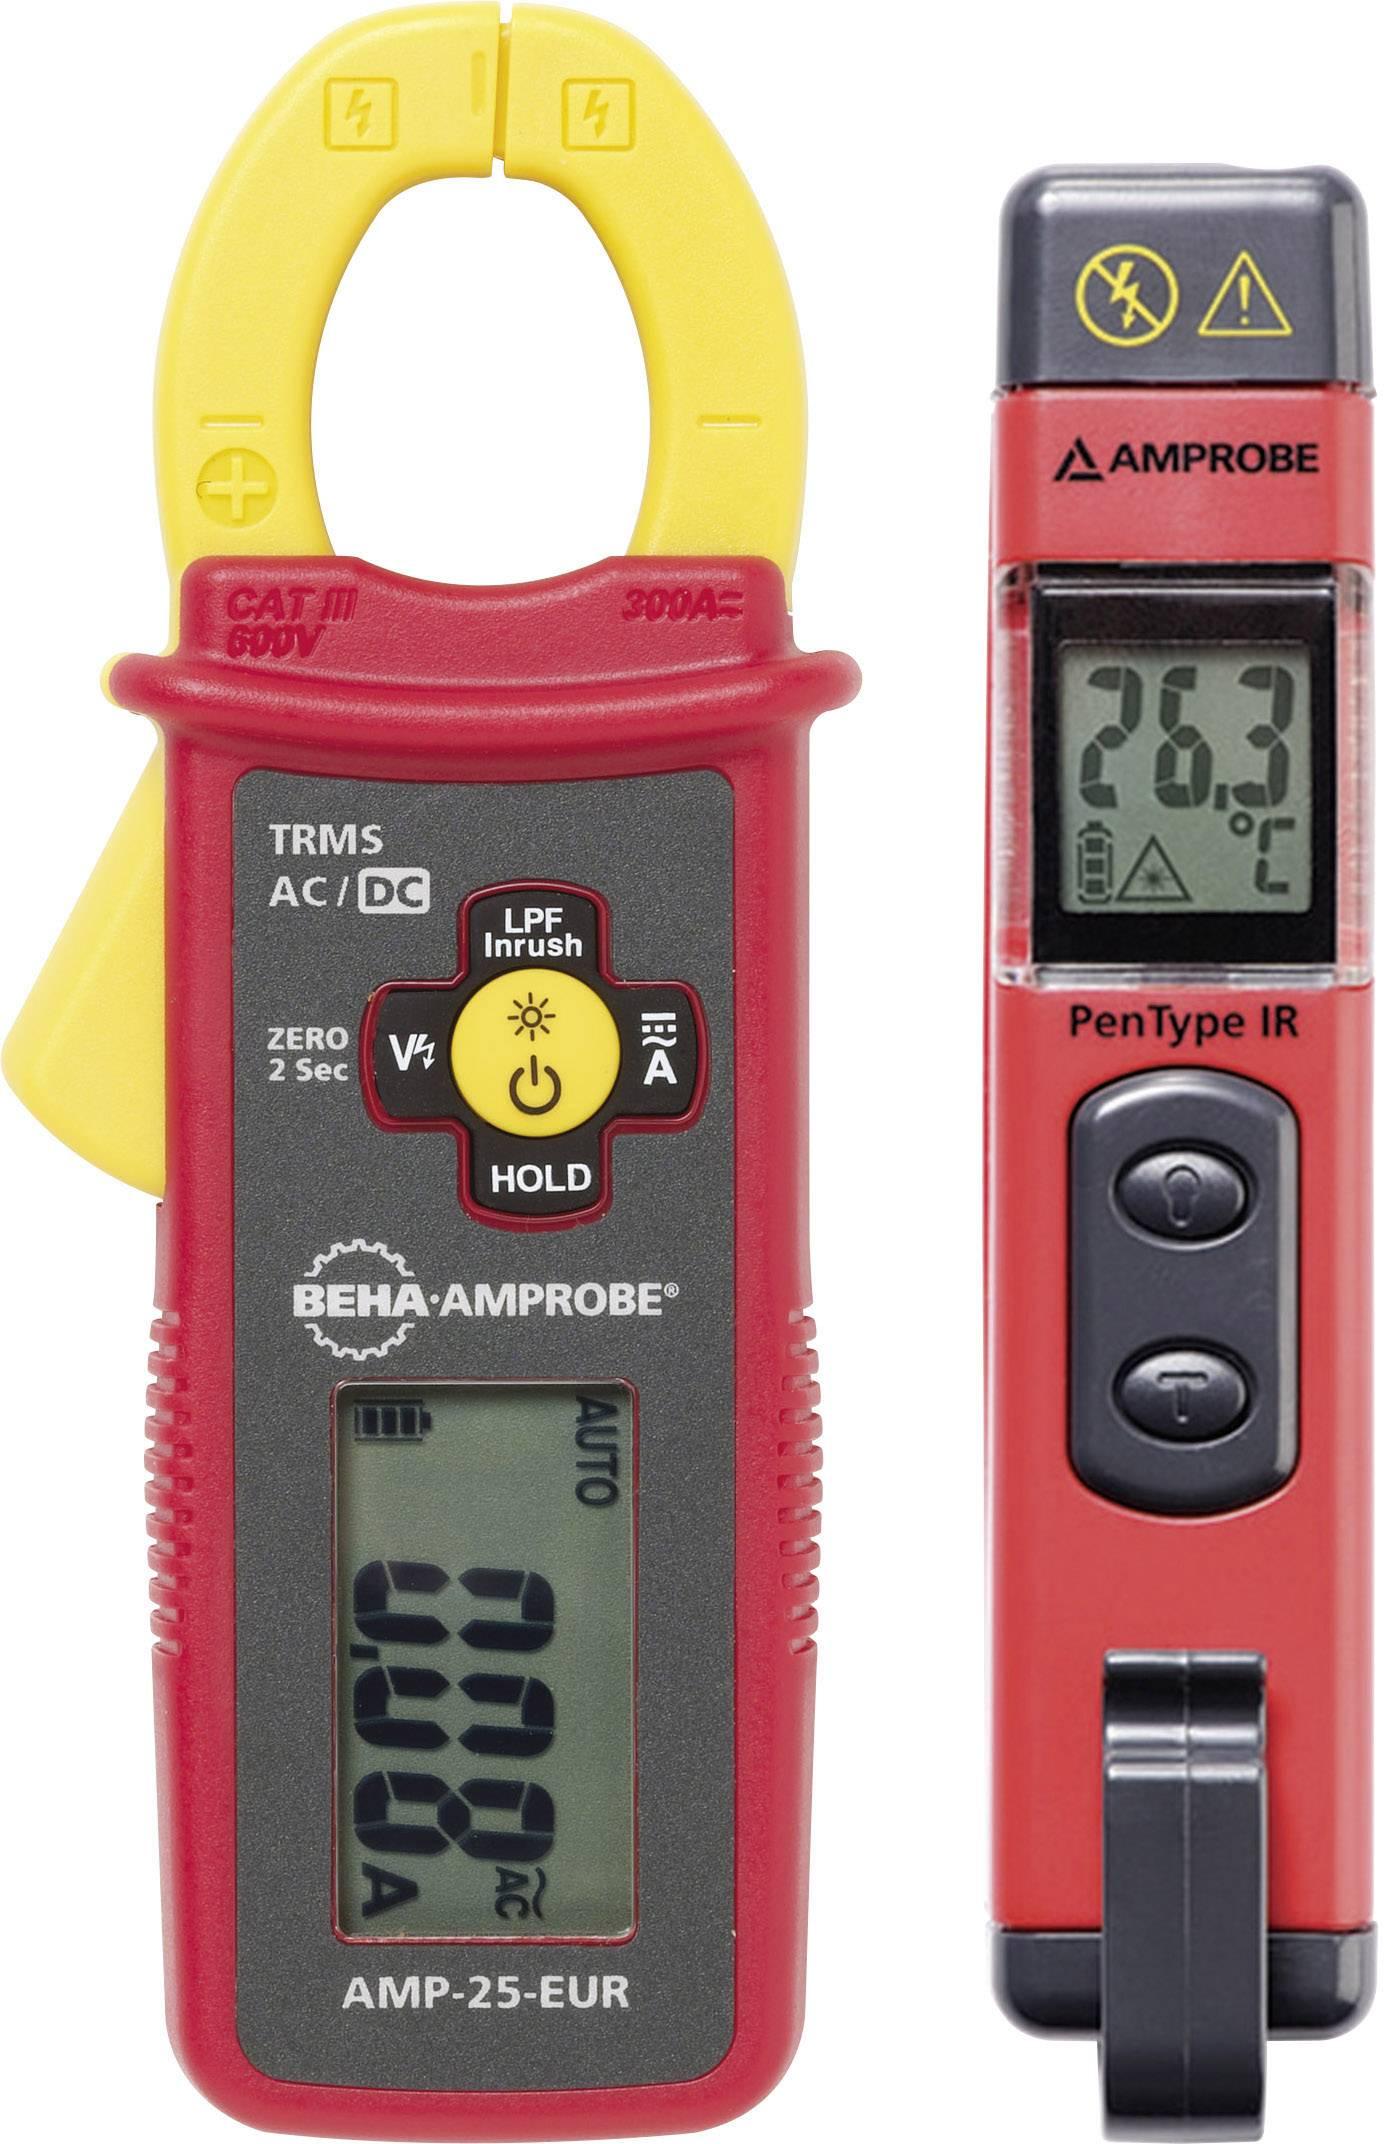 Strömtång med IR termometer | Termometer.se Termometer